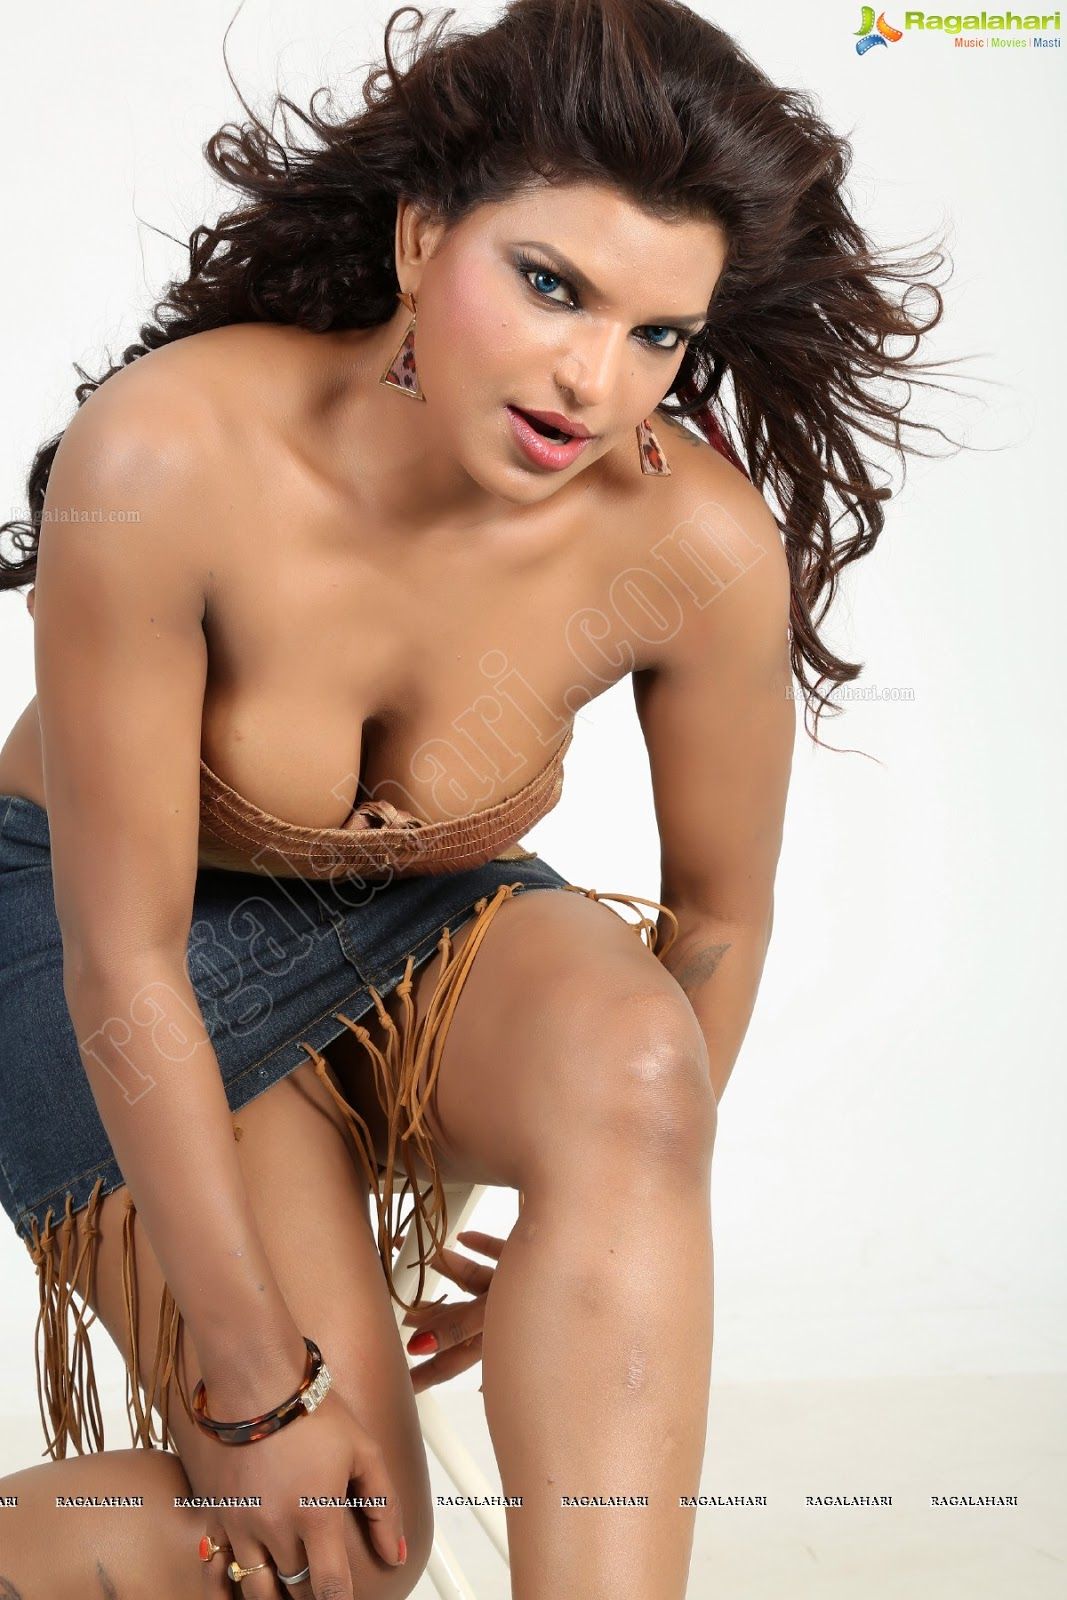 Shalini Naidu Daily Bollywood in Južnoindijske slike igralk-2755